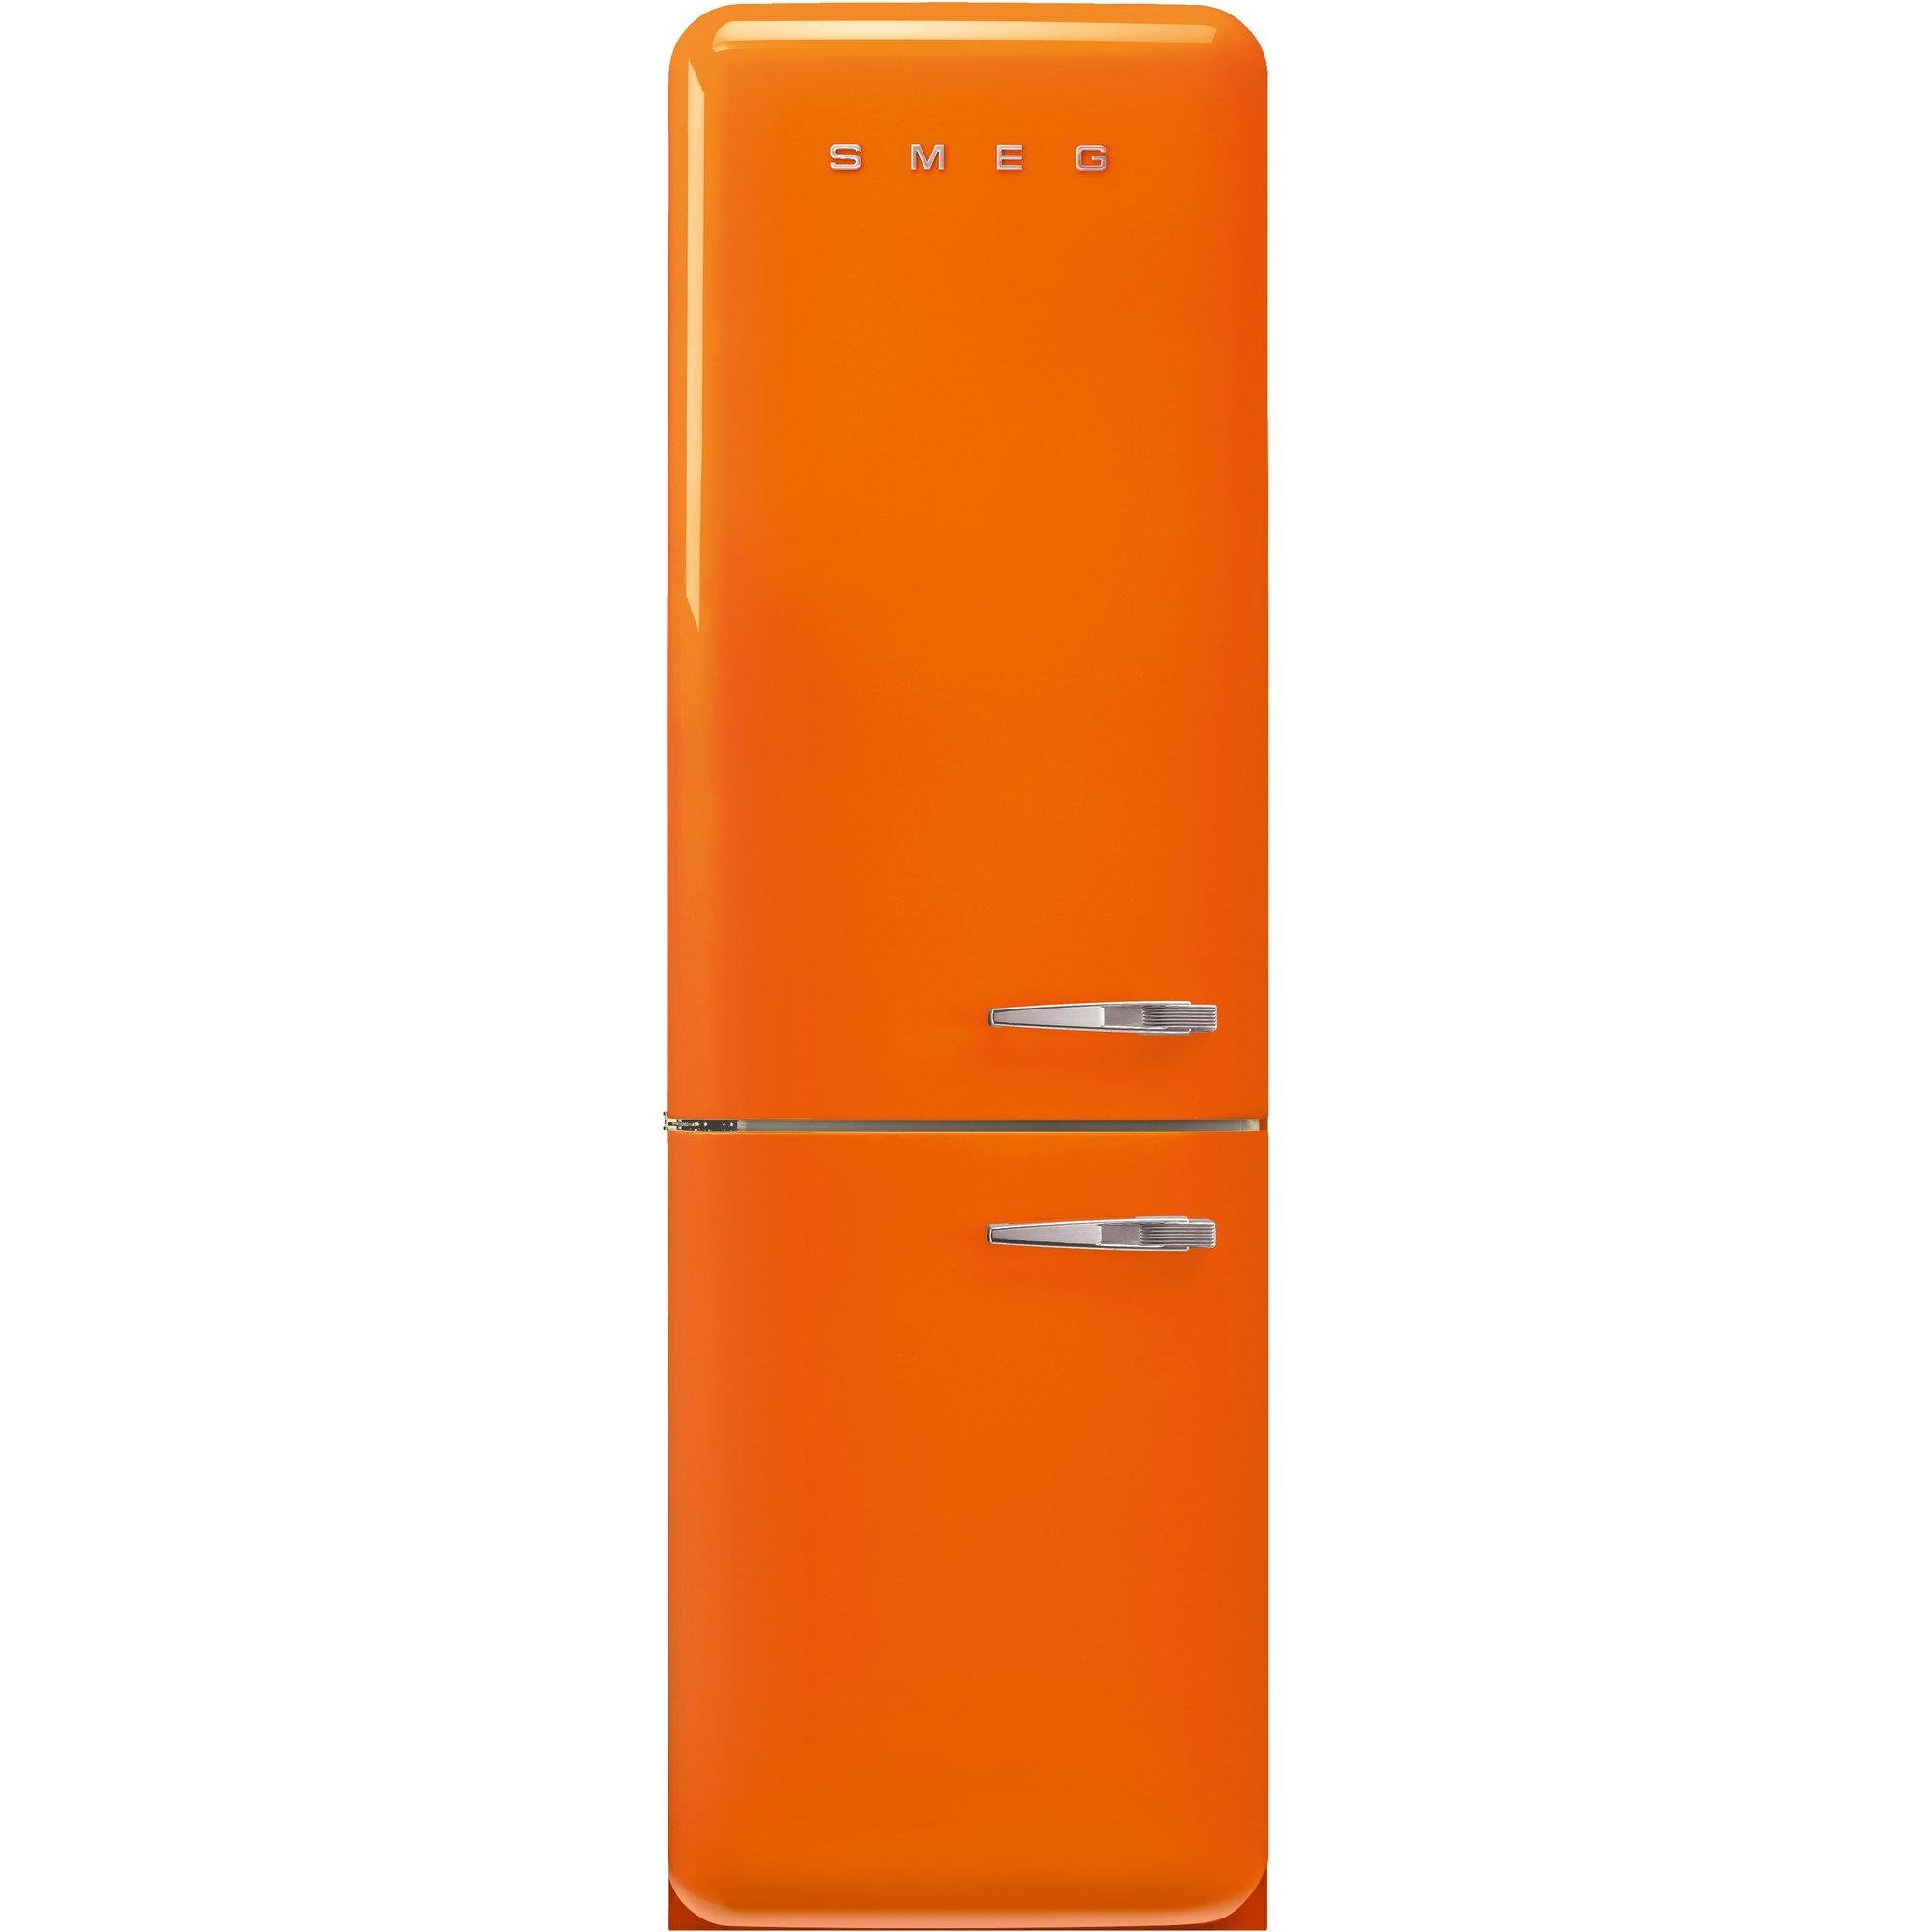 Smeg FAB32LOR5 Køle-/fryseskab orange